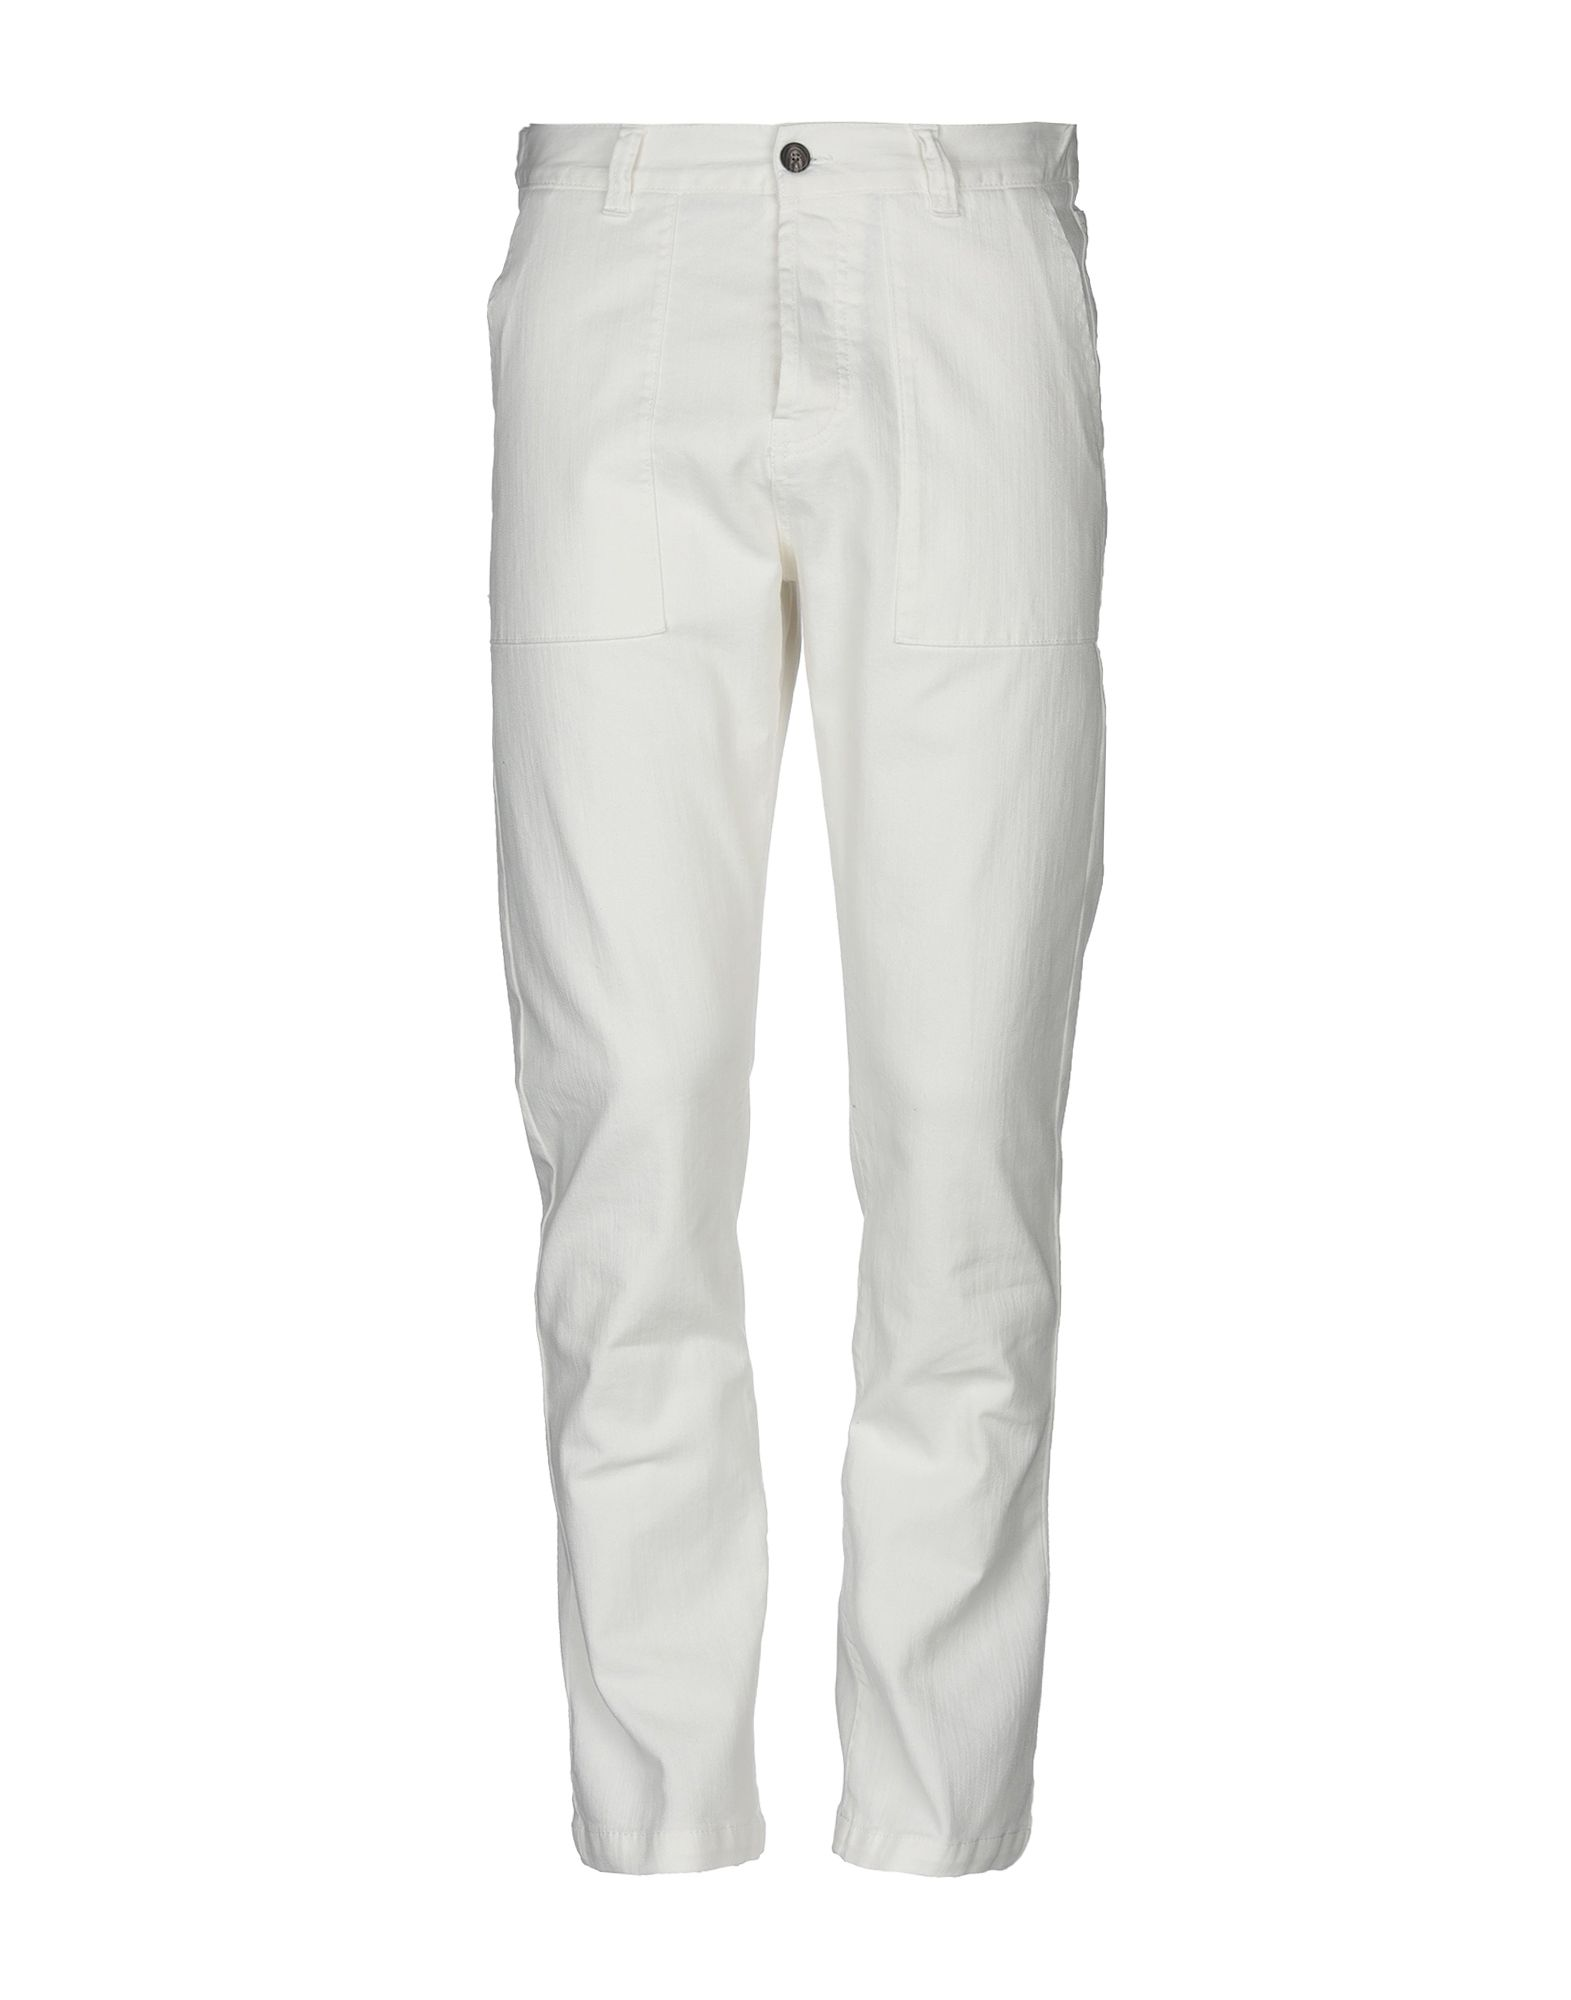 Pantaloni Jeans At.P.Co At.P.Co uomo - 42704963QN  Sie sparen 35% - 70%